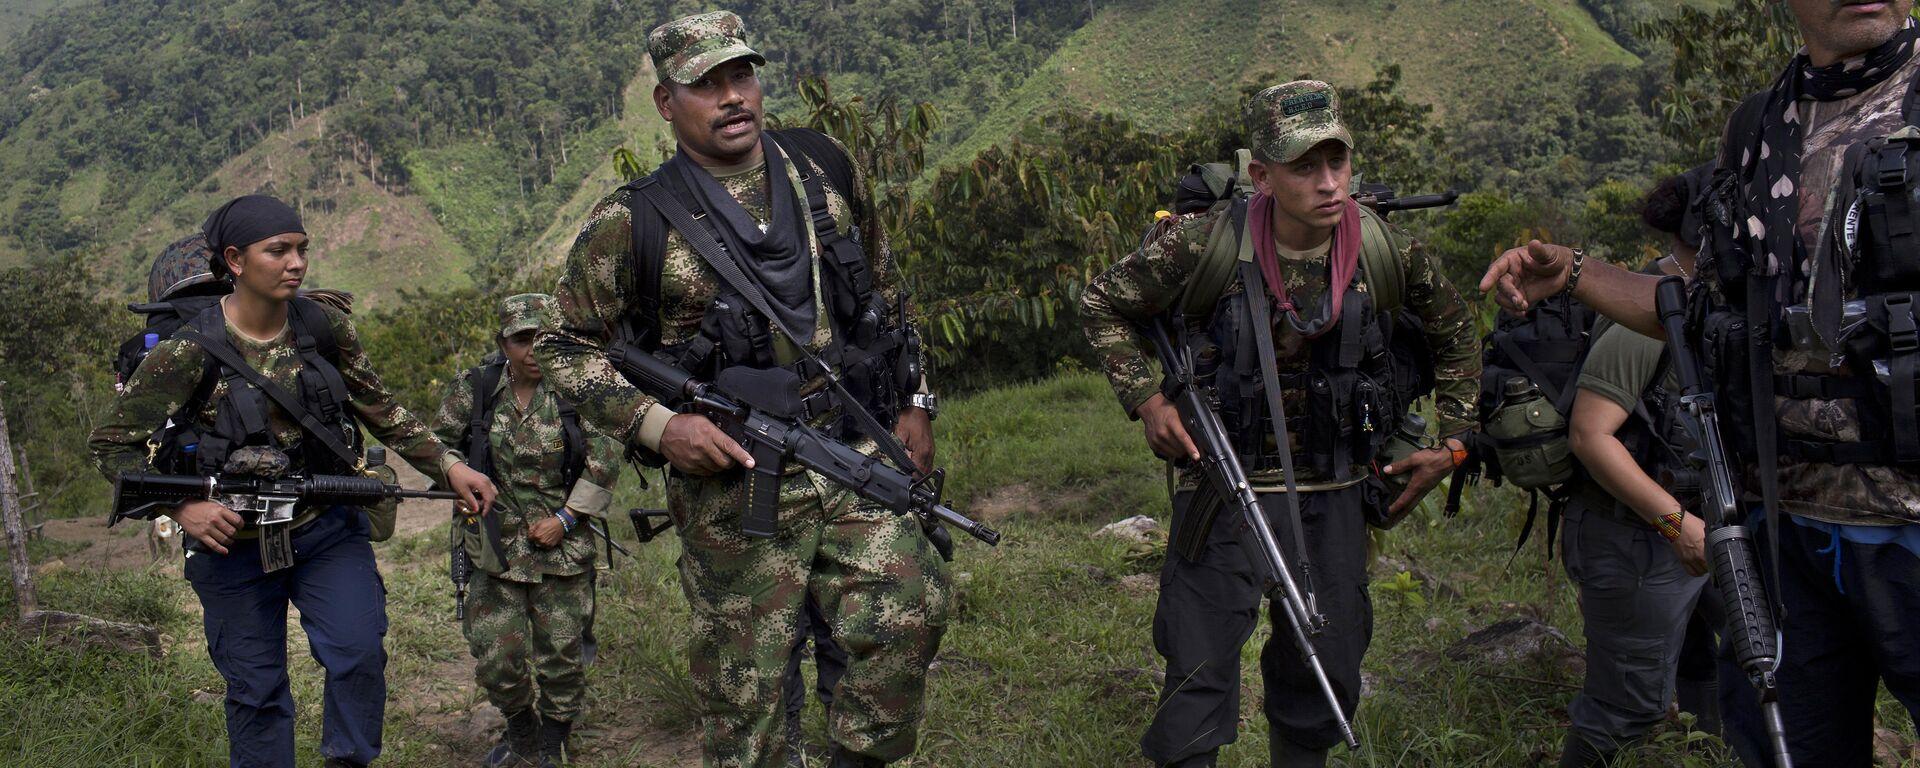 Combatientes de las FARC - Sputnik Mundo, 1920, 23.07.2021